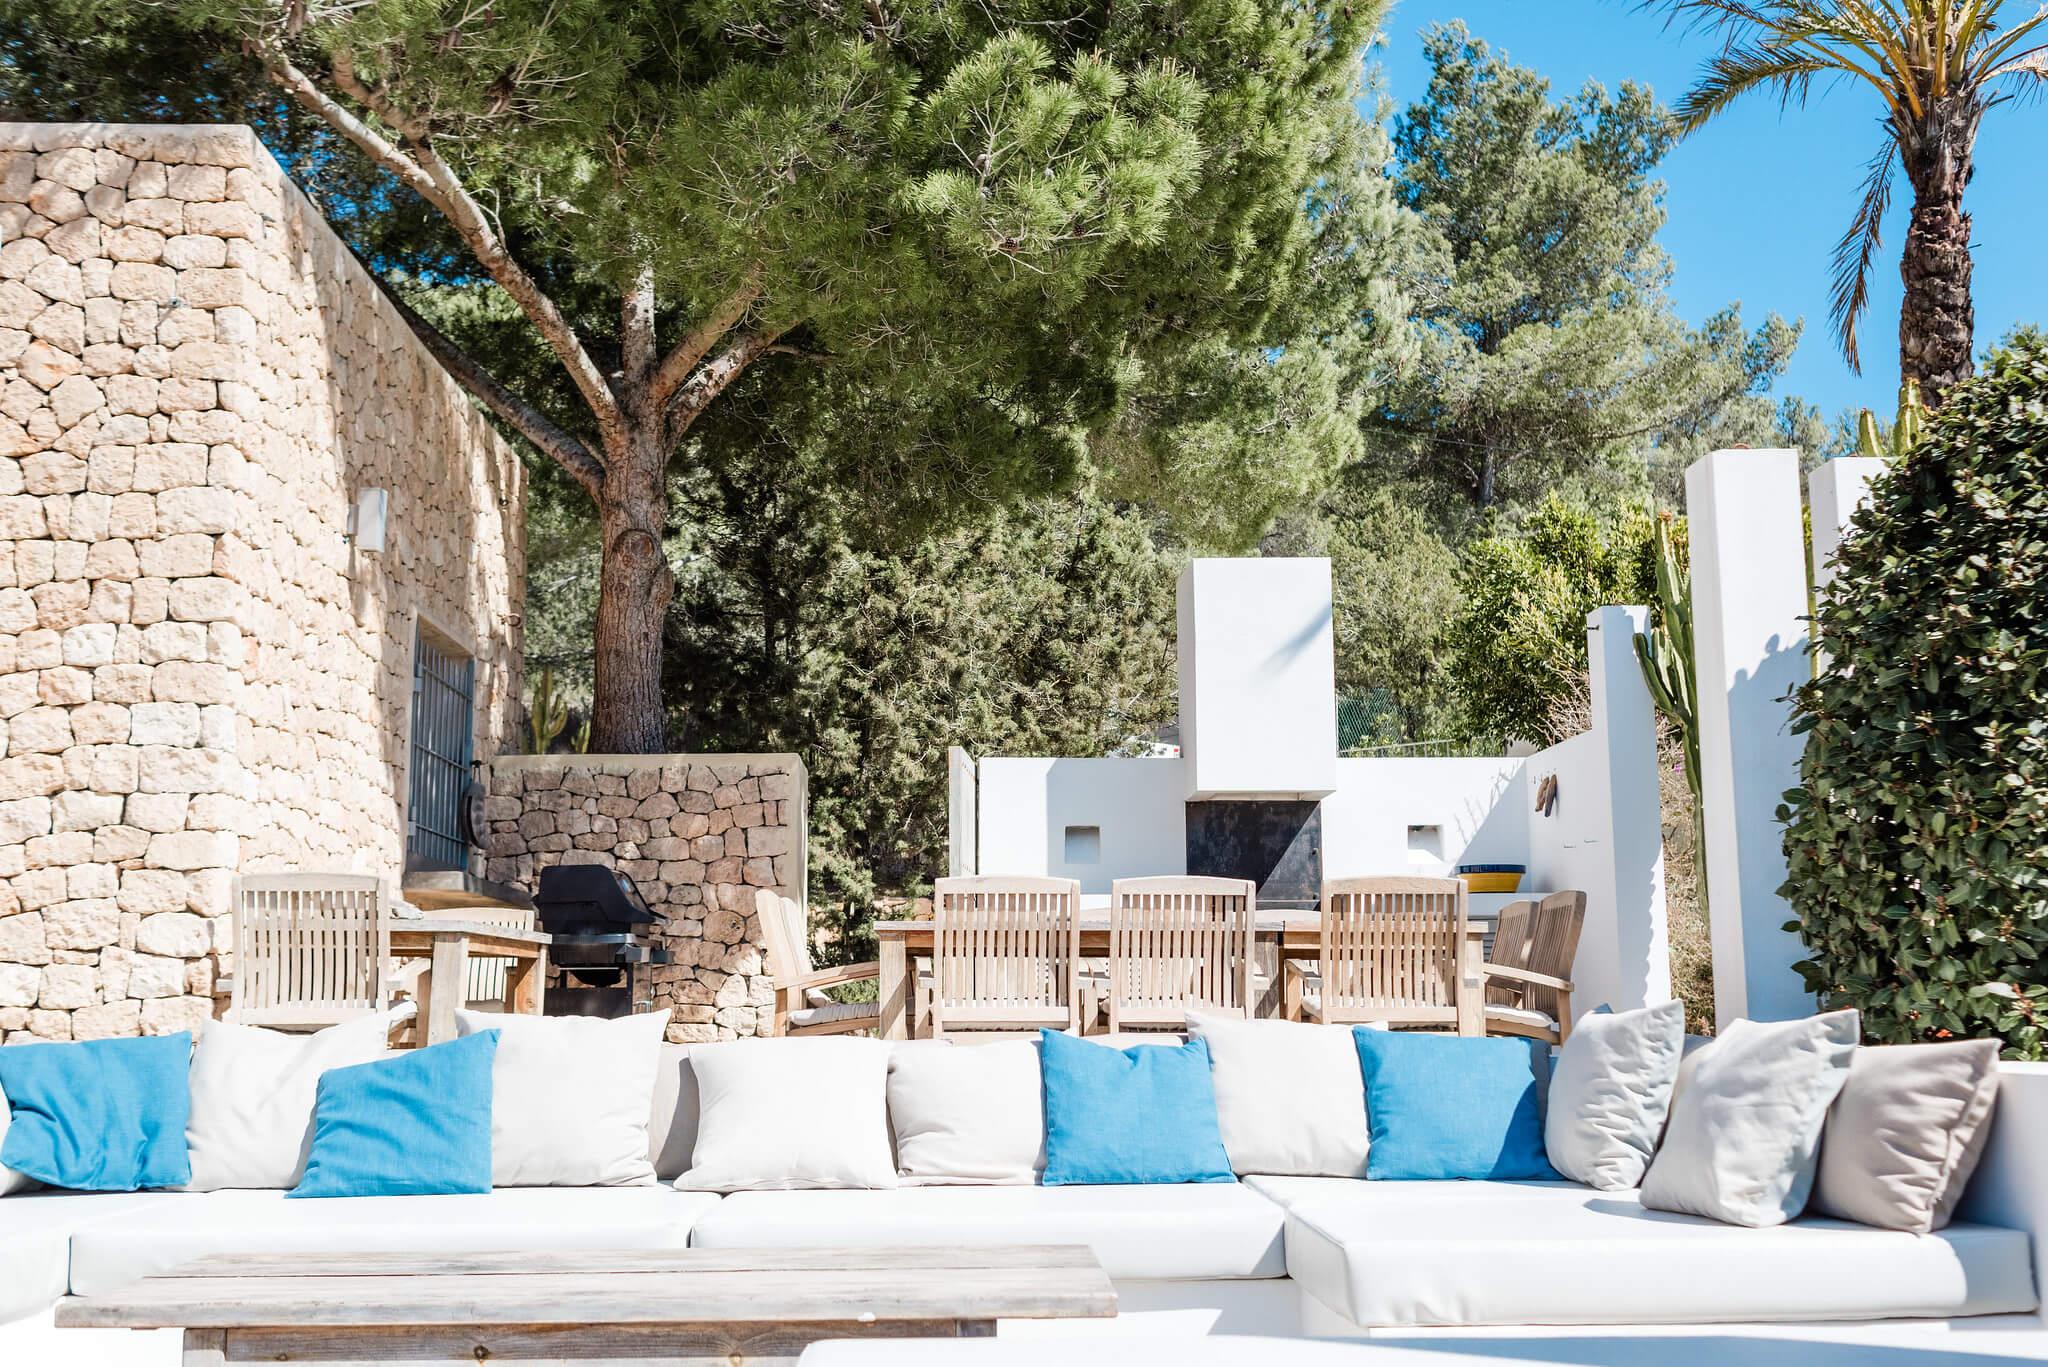 https://www.white-ibiza.com/wp-content/uploads/2020/06/white-ibiza-villas-casa-nyah-exterior-outside-seating.jpg